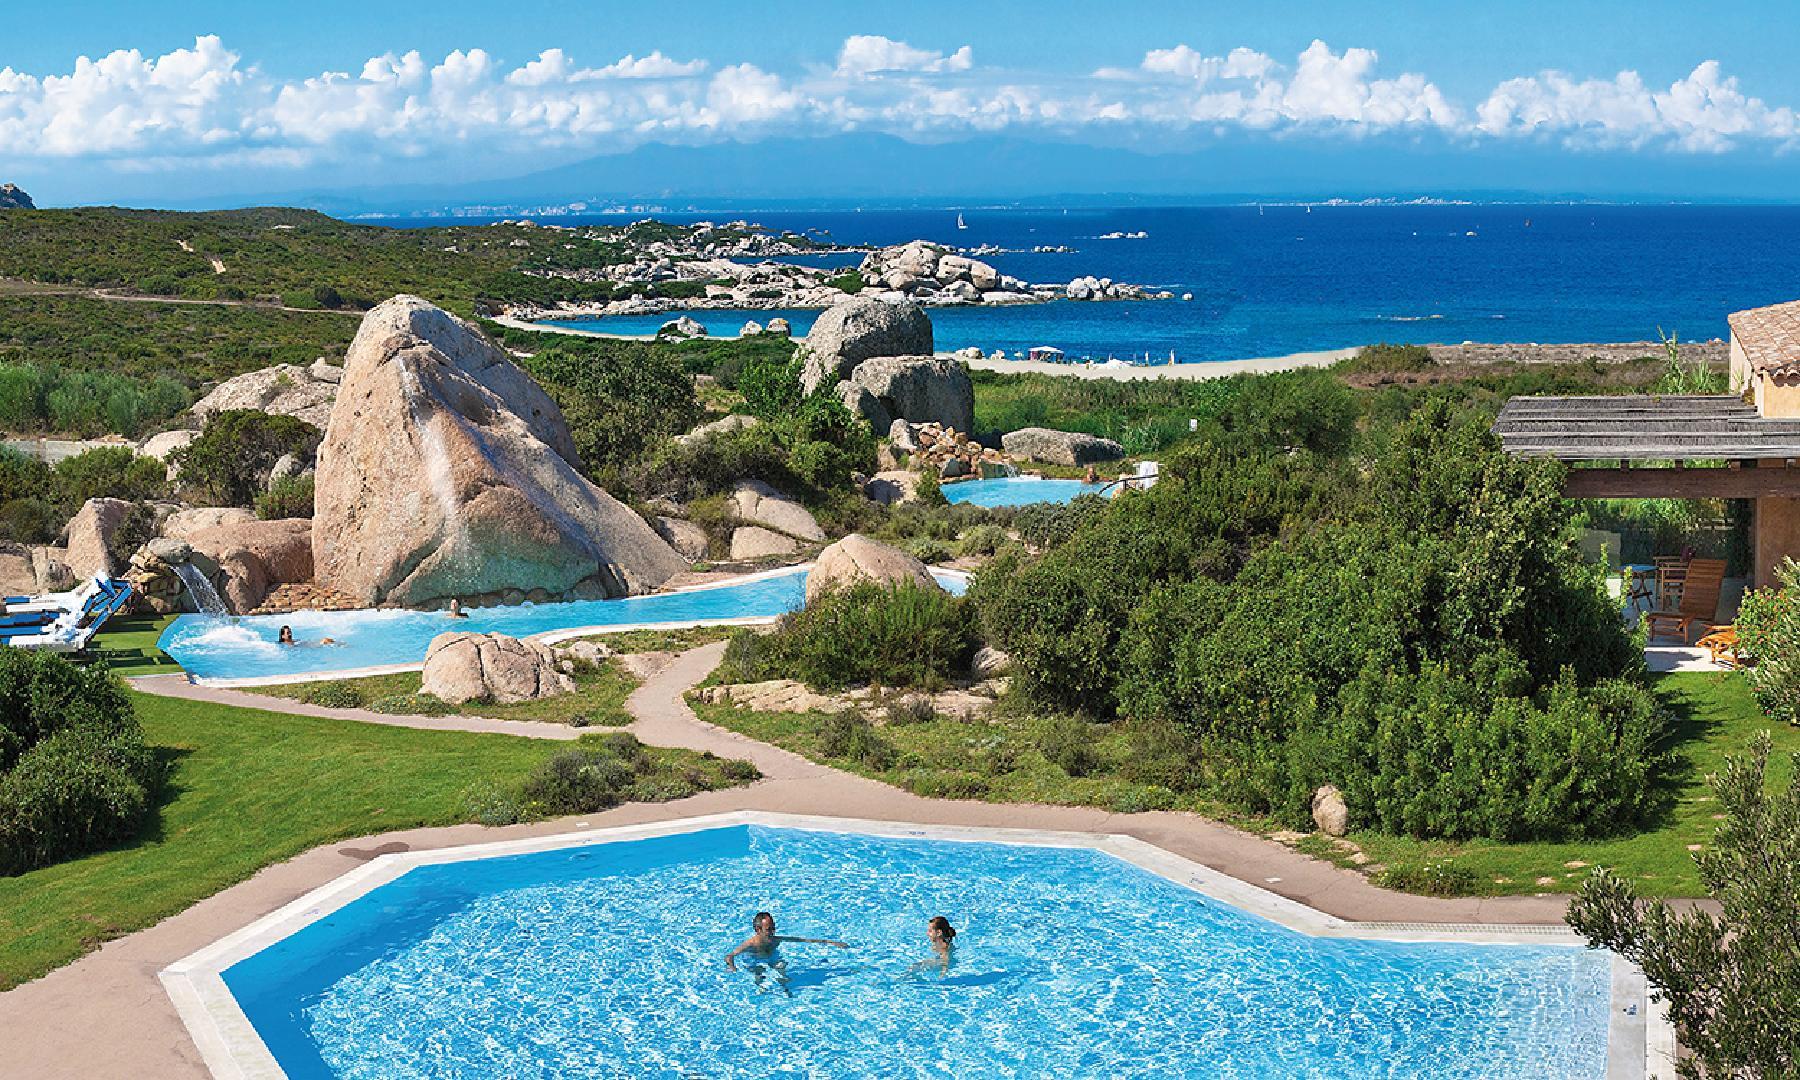 Valle dell'Erica Resort Thalasso & SPA, Santa Teresa Gallura